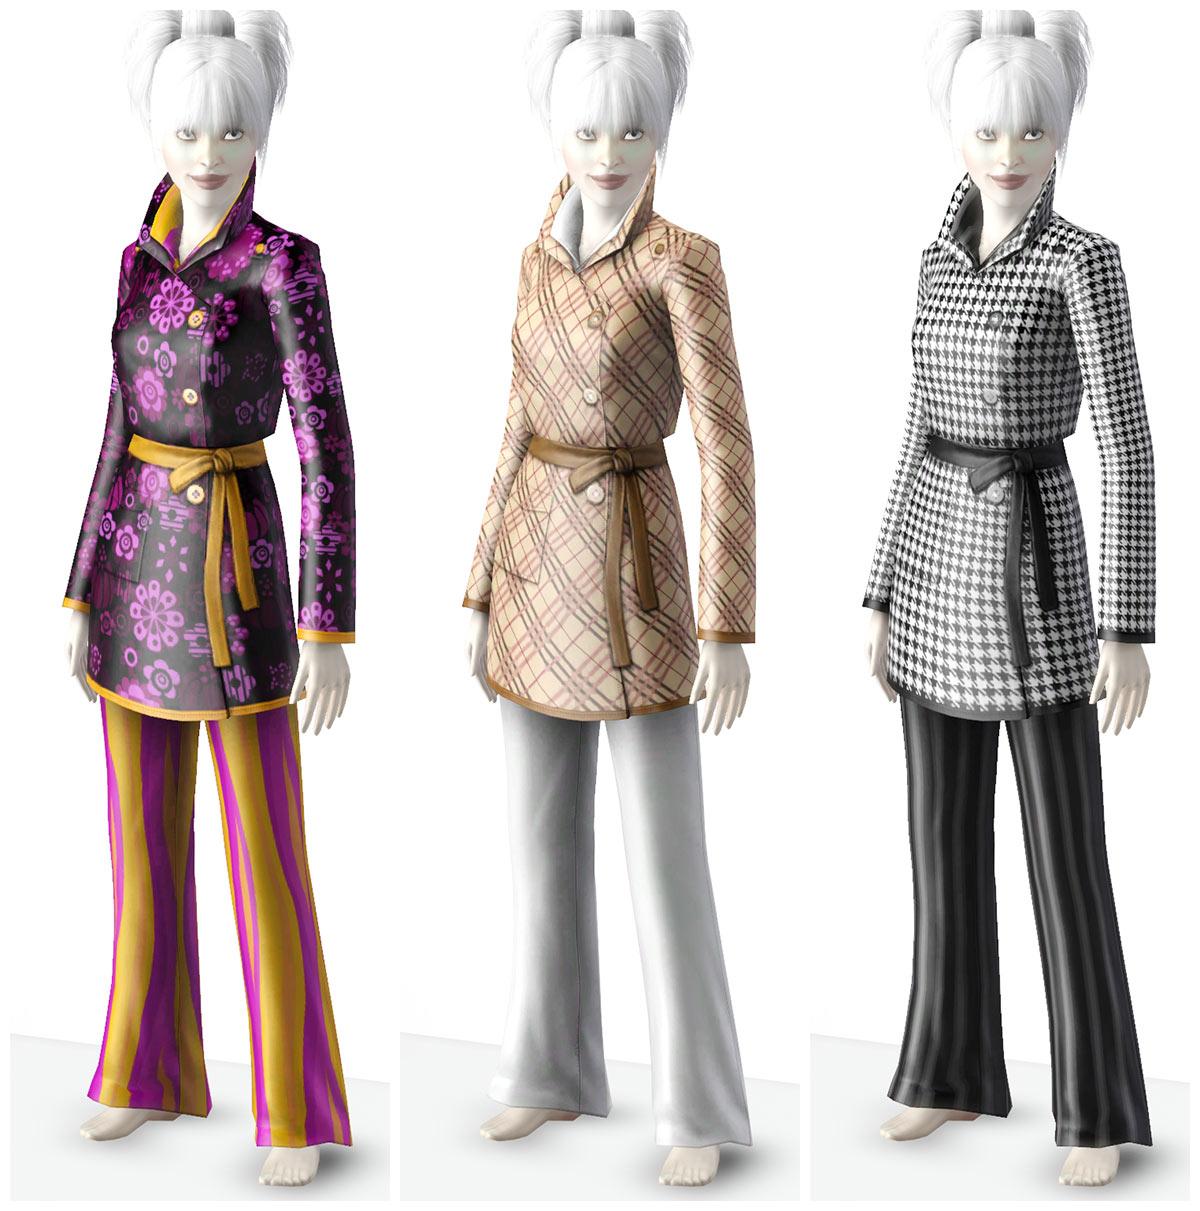 http://parsimonious.org/fashion3/files/k8foutsupersleeksuit.jpg